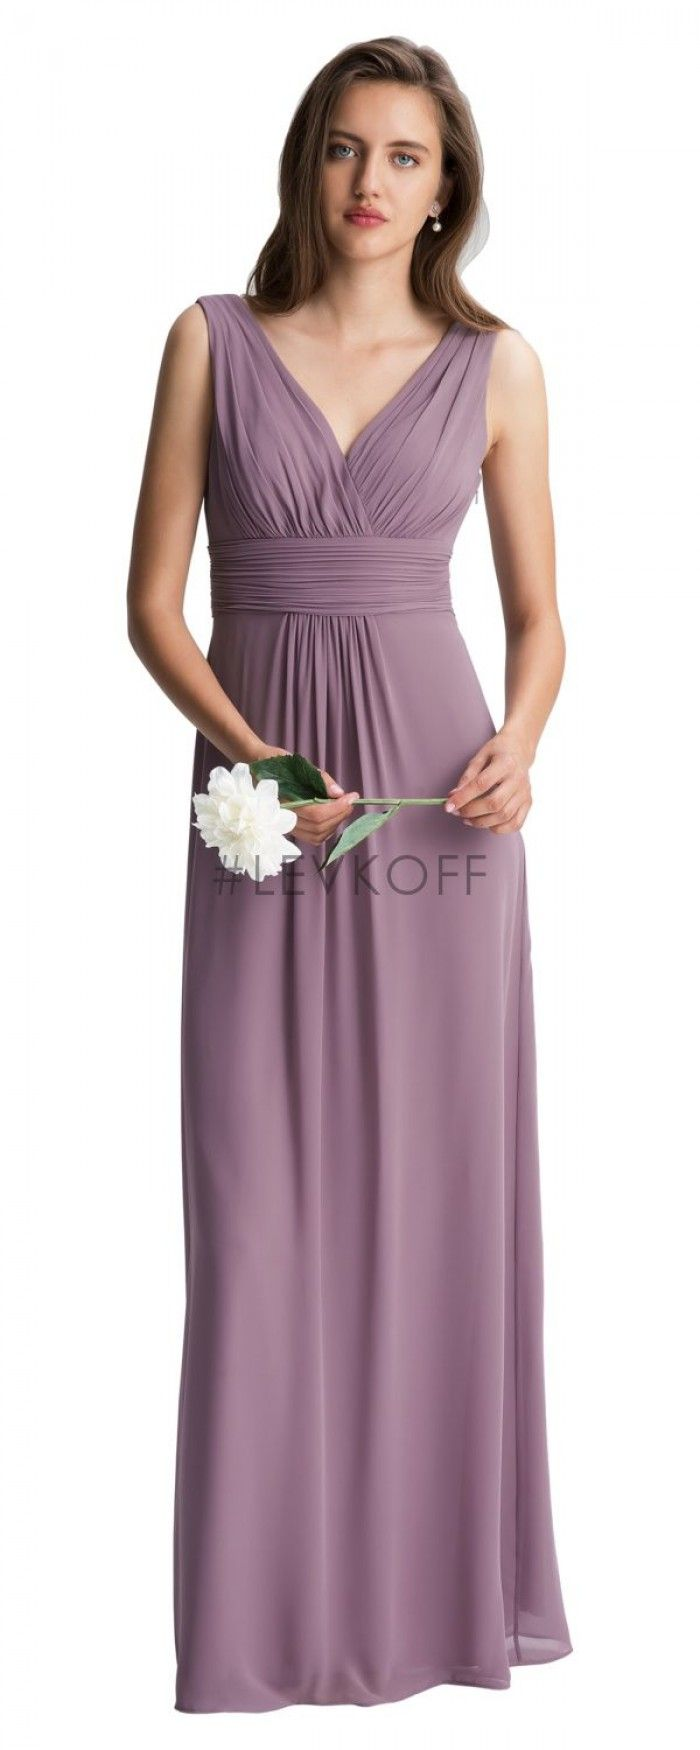 195 mejores imágenes de Bridesmaid Dresses en Pinterest | Taller ...